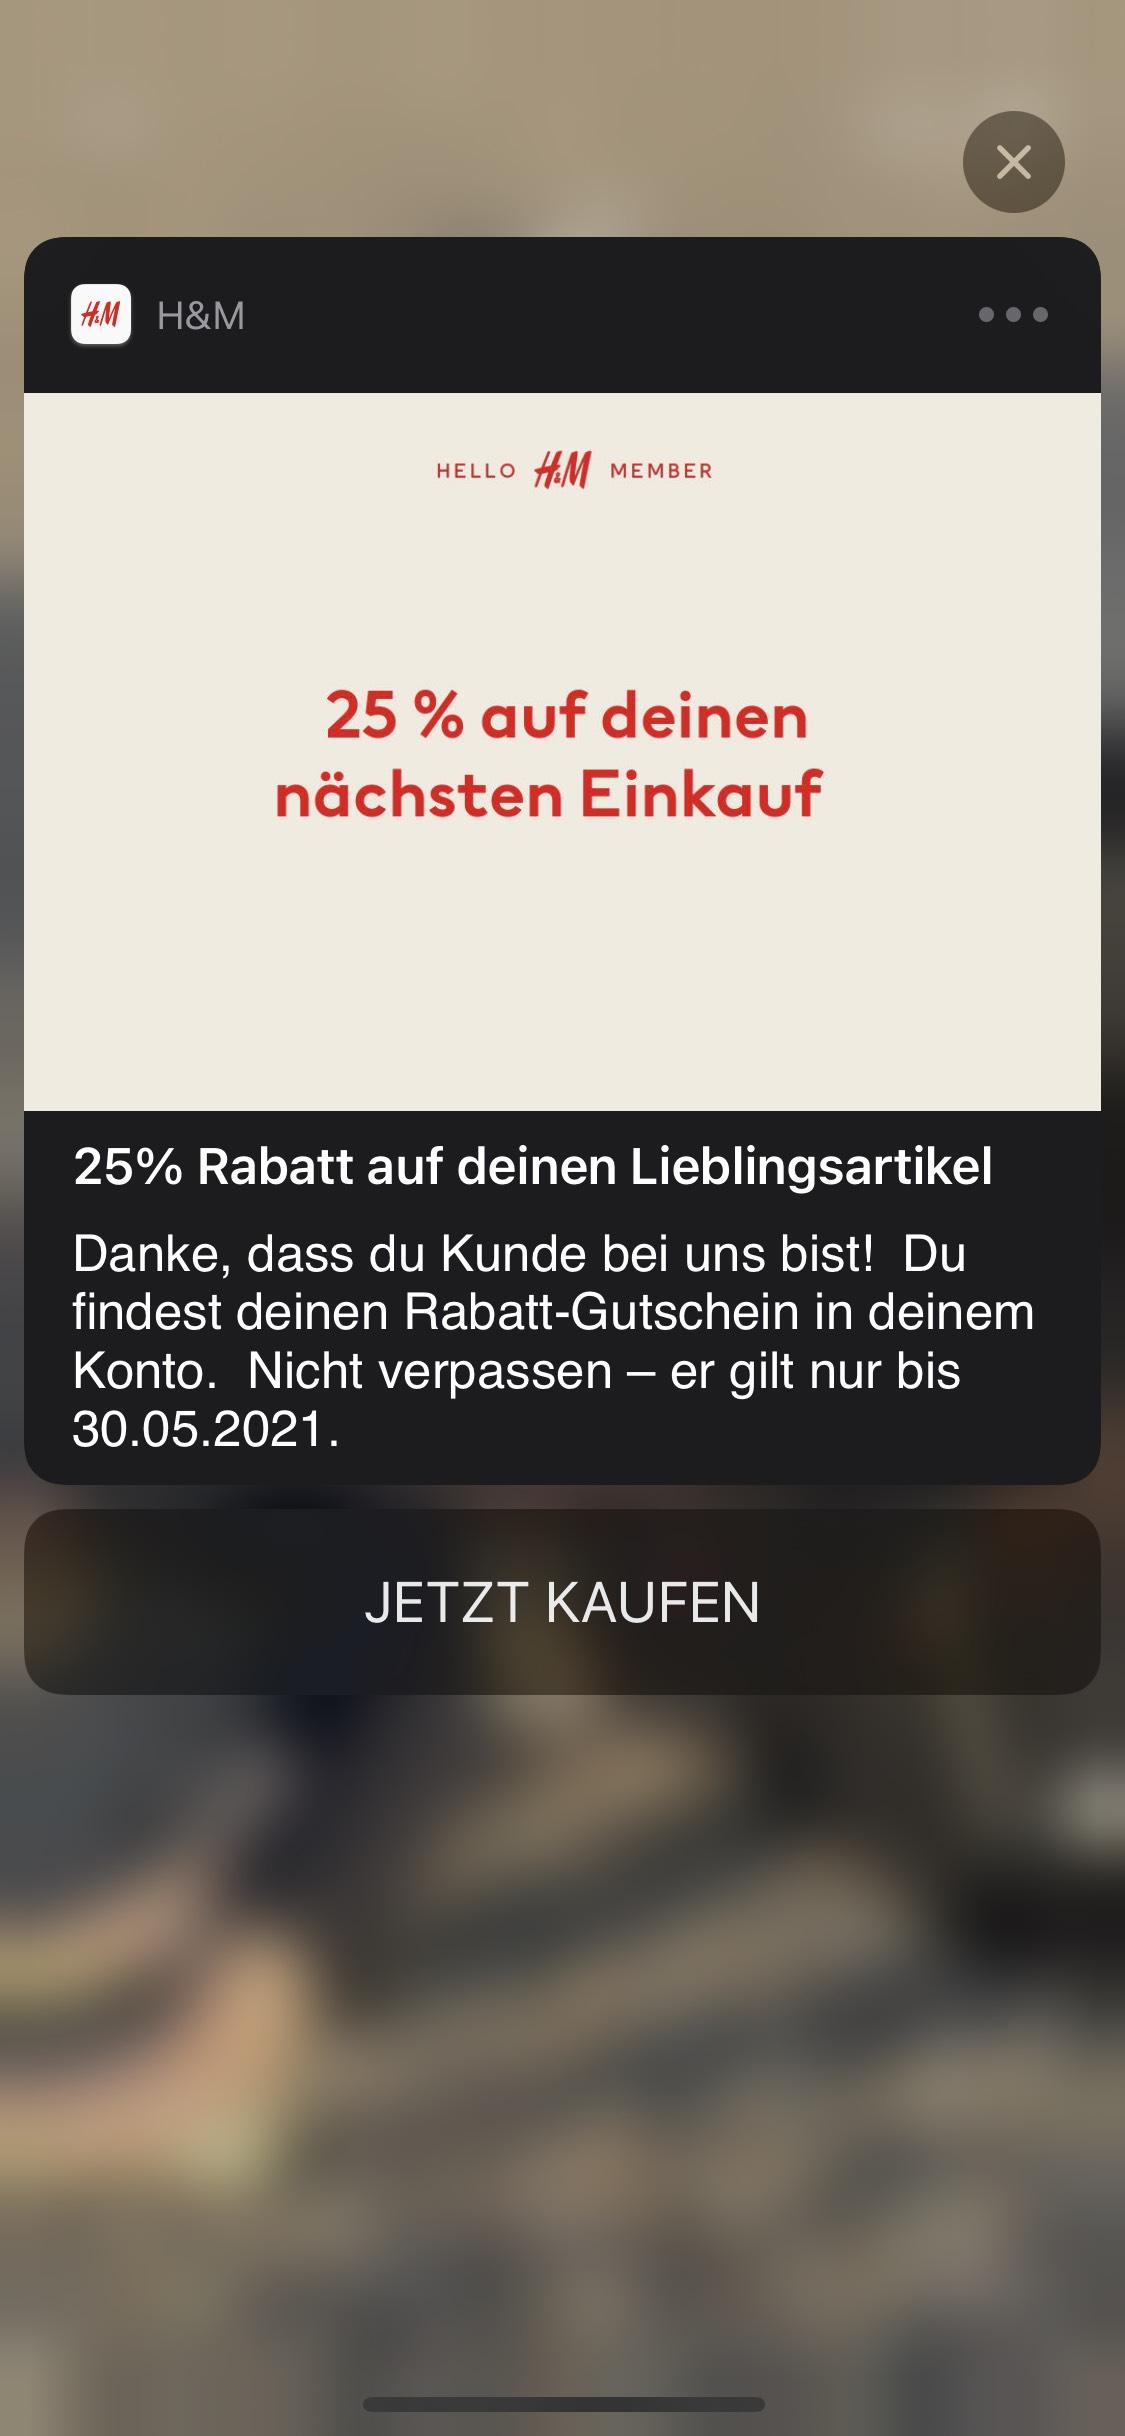 H&M -25% Rabatt! [vllt Personalisiert]